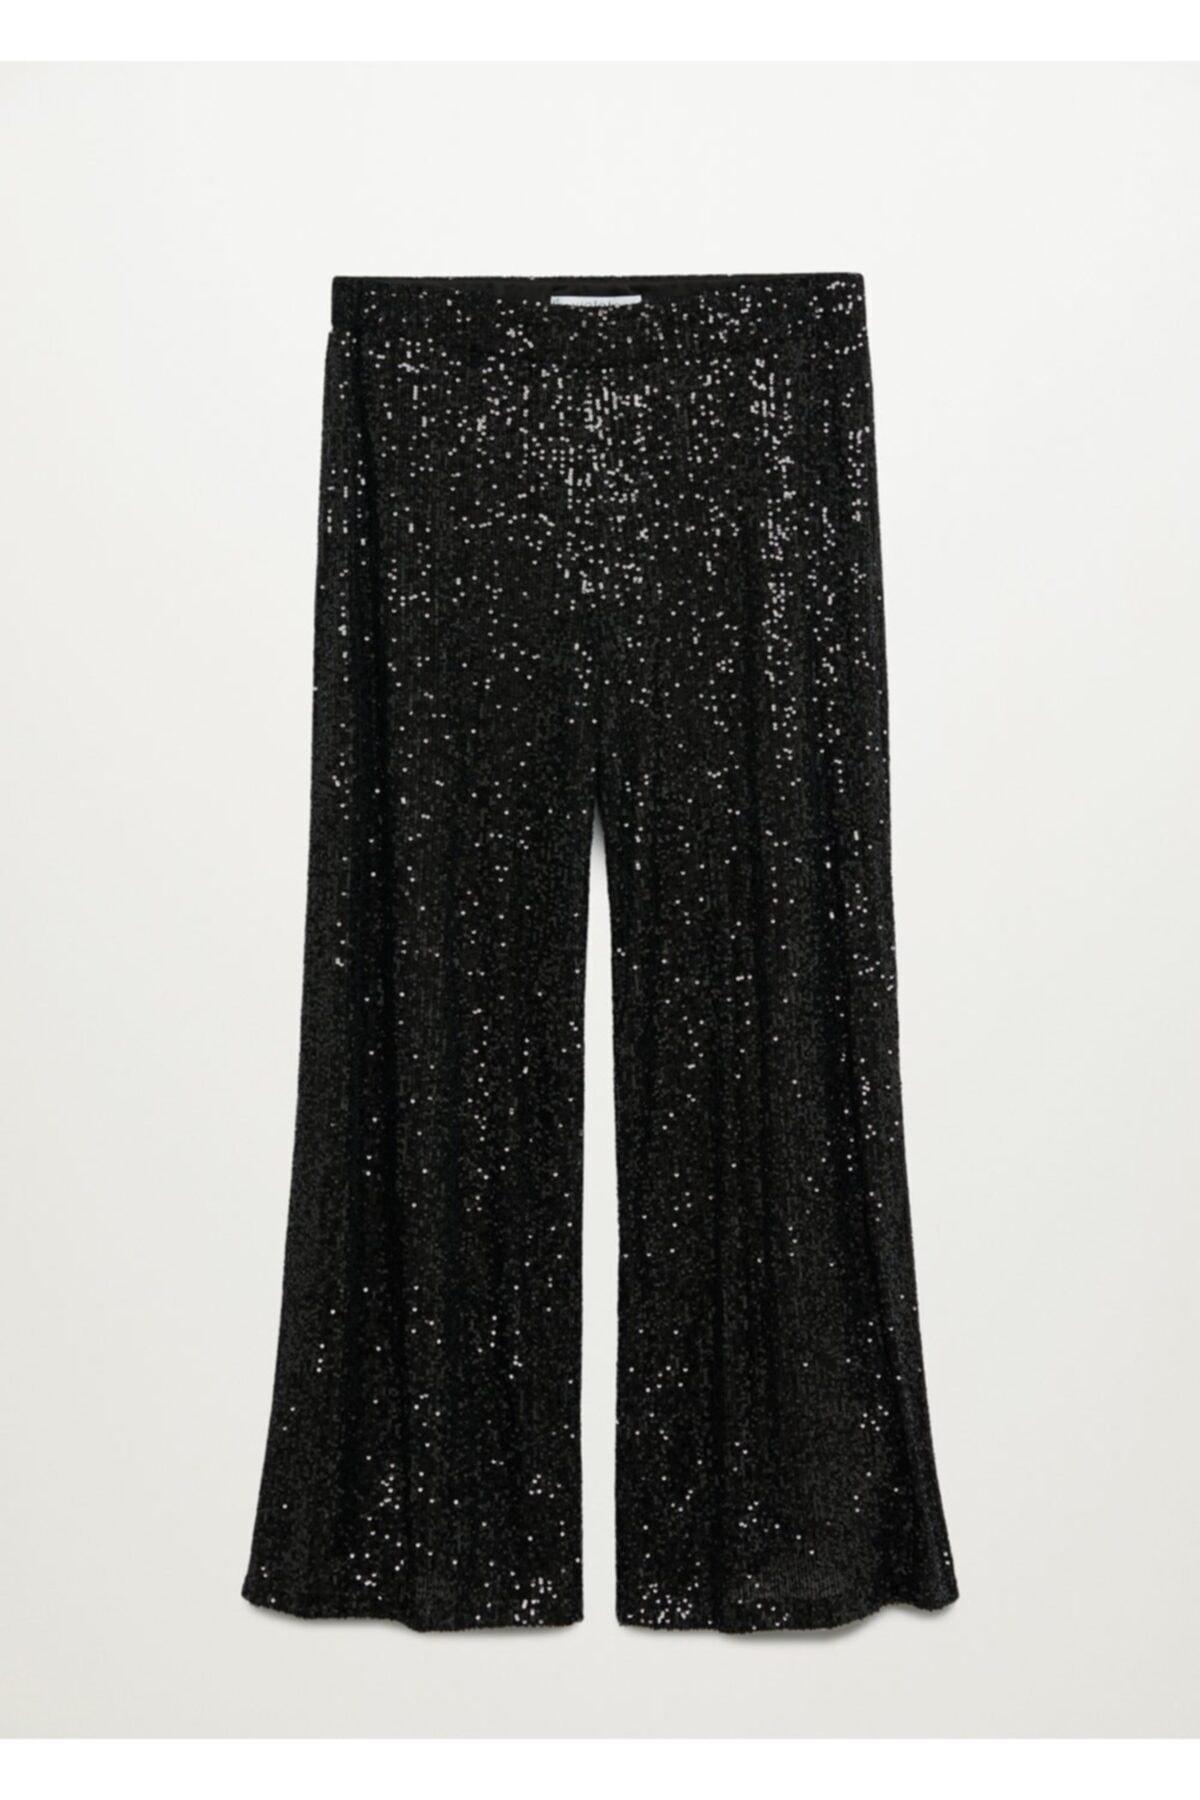 Violeta by MANGO Kadın Siyah Pantolon 77049204 1